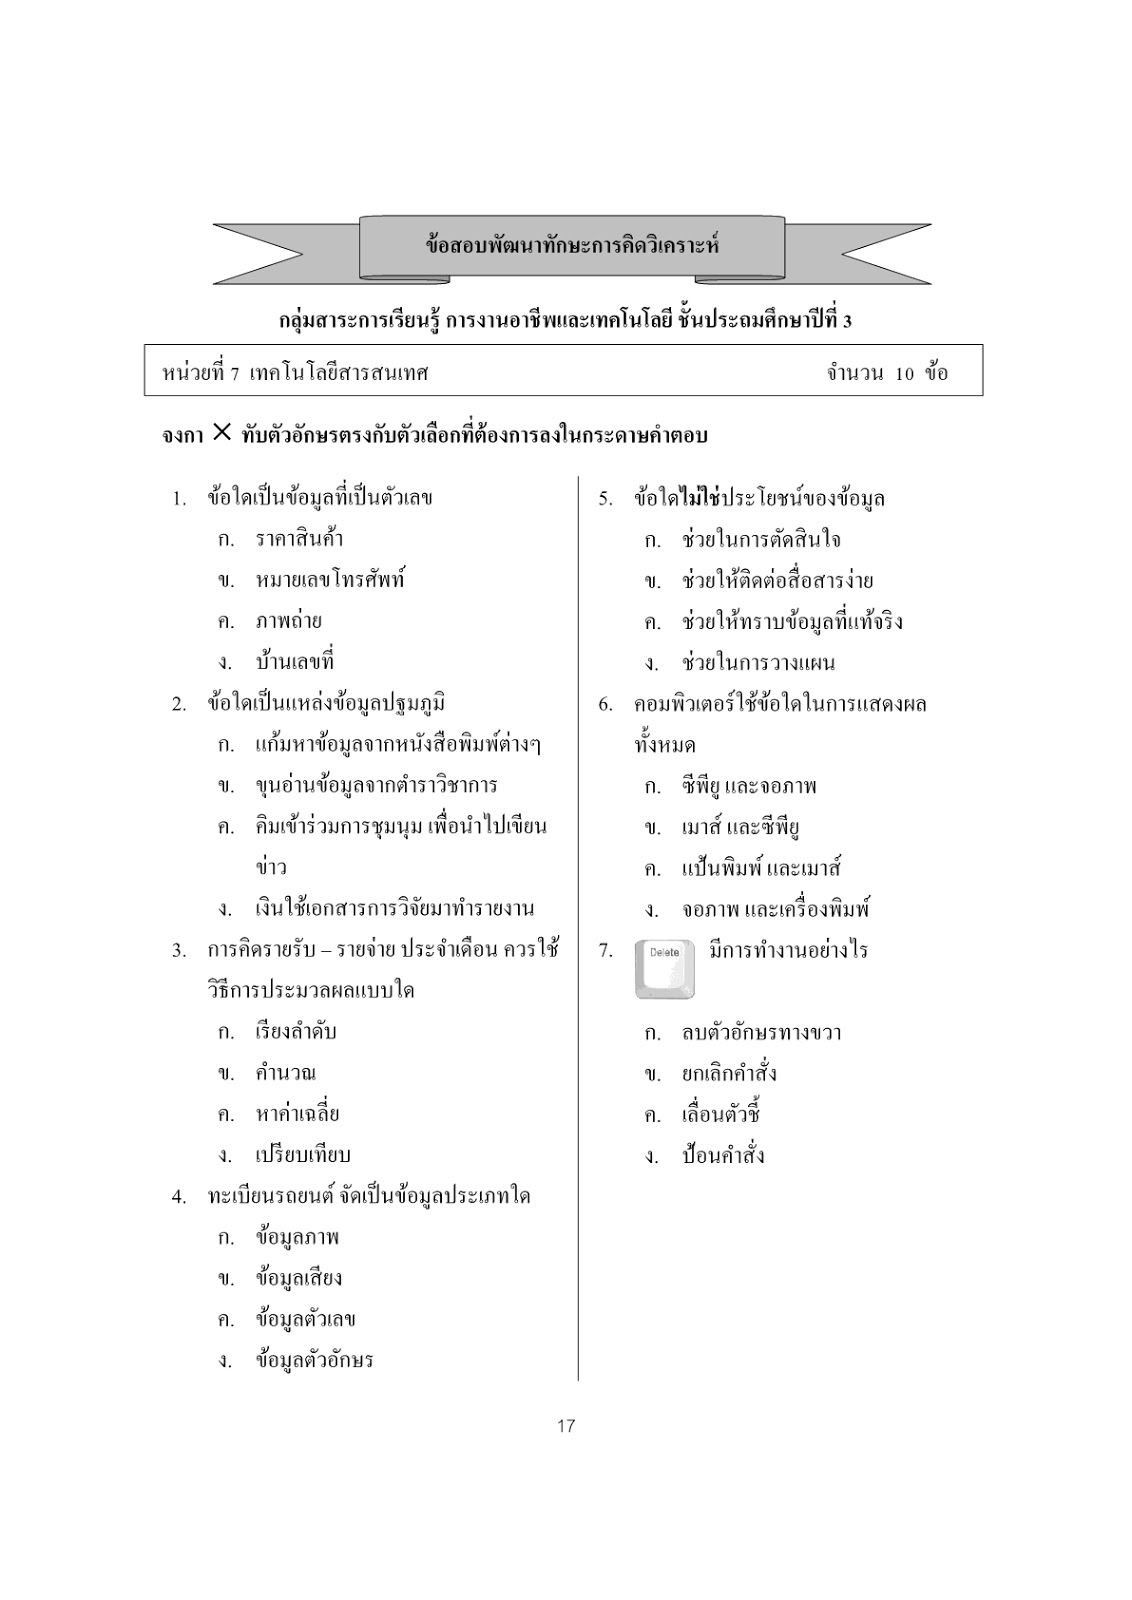 Science Fusion Grade 3 Worksheets Free Printable Math Worksheets Printable Math Worksheets Basic Math Skills